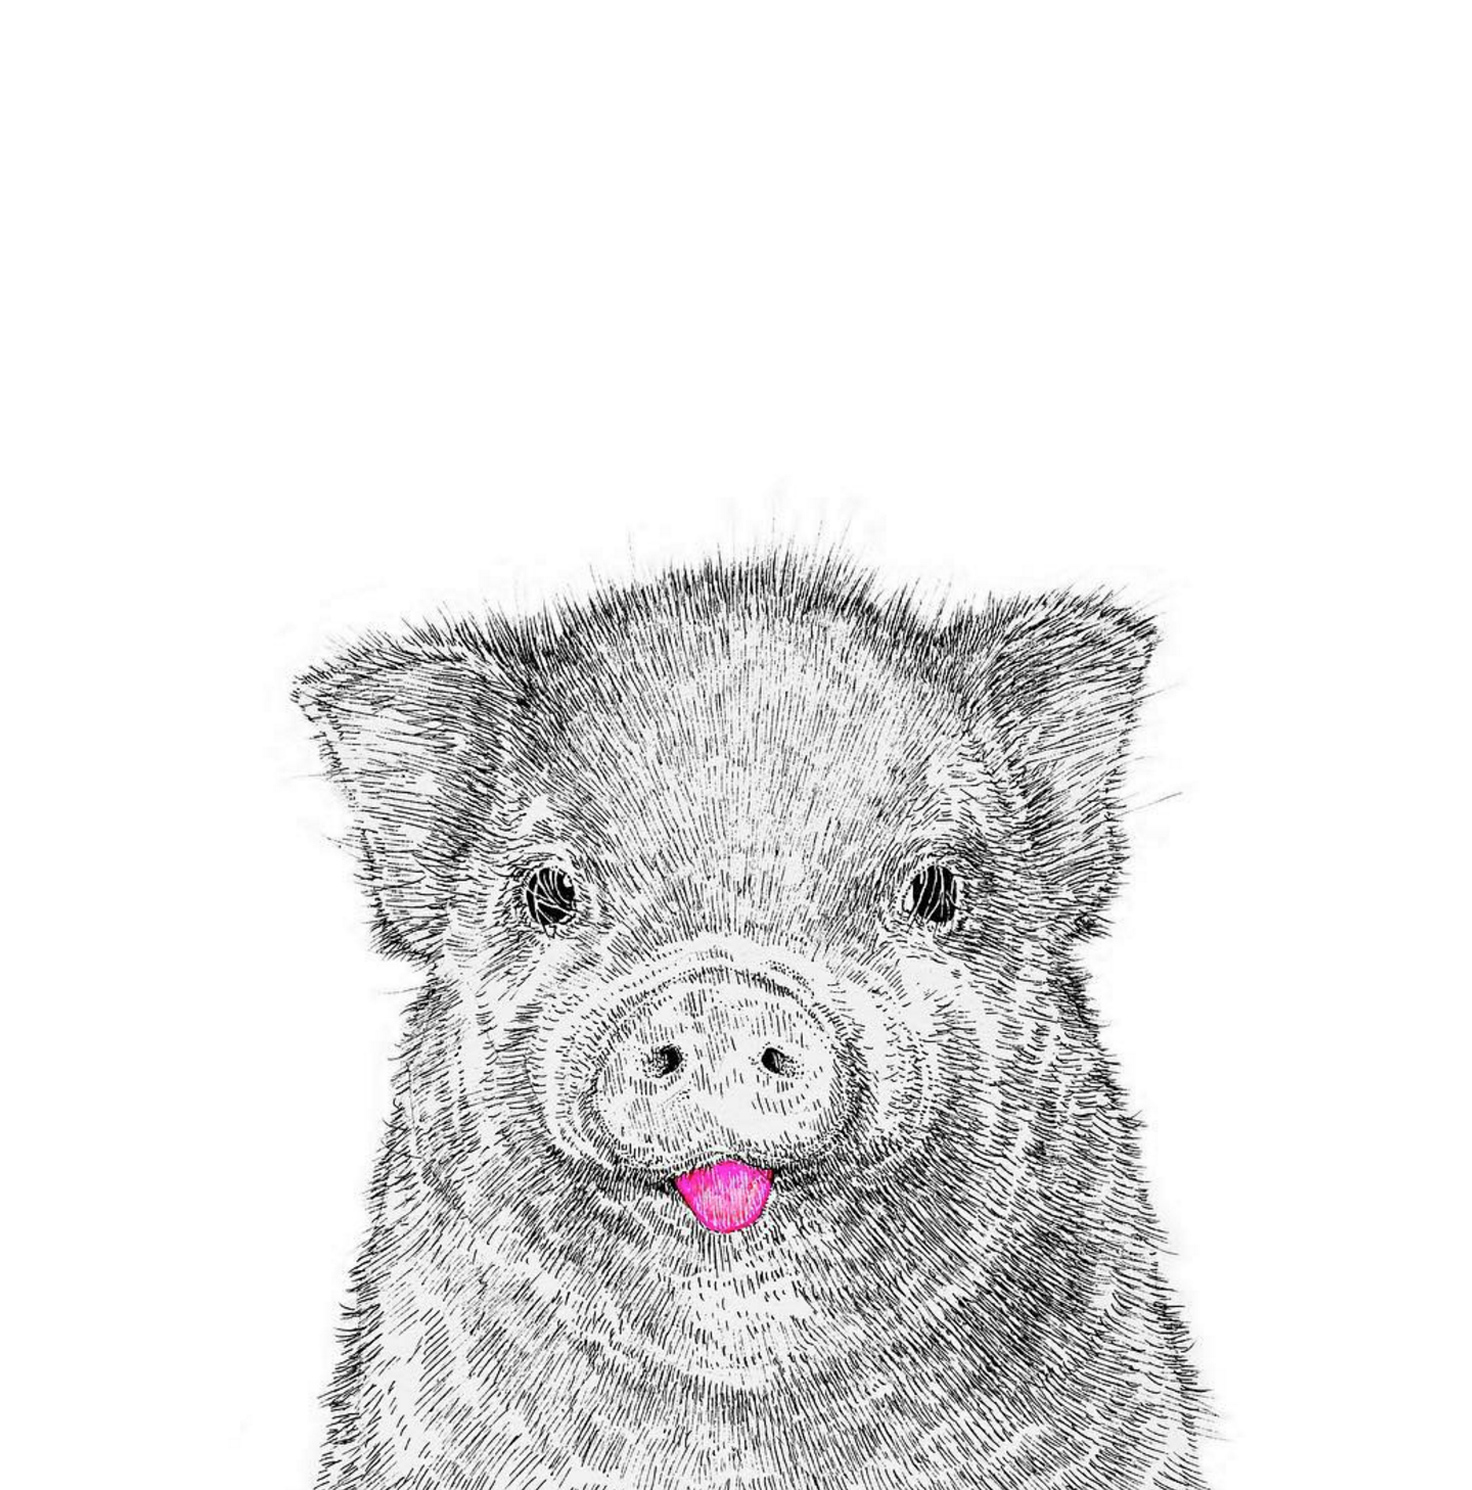 NikiPilkington_Pig.jpg